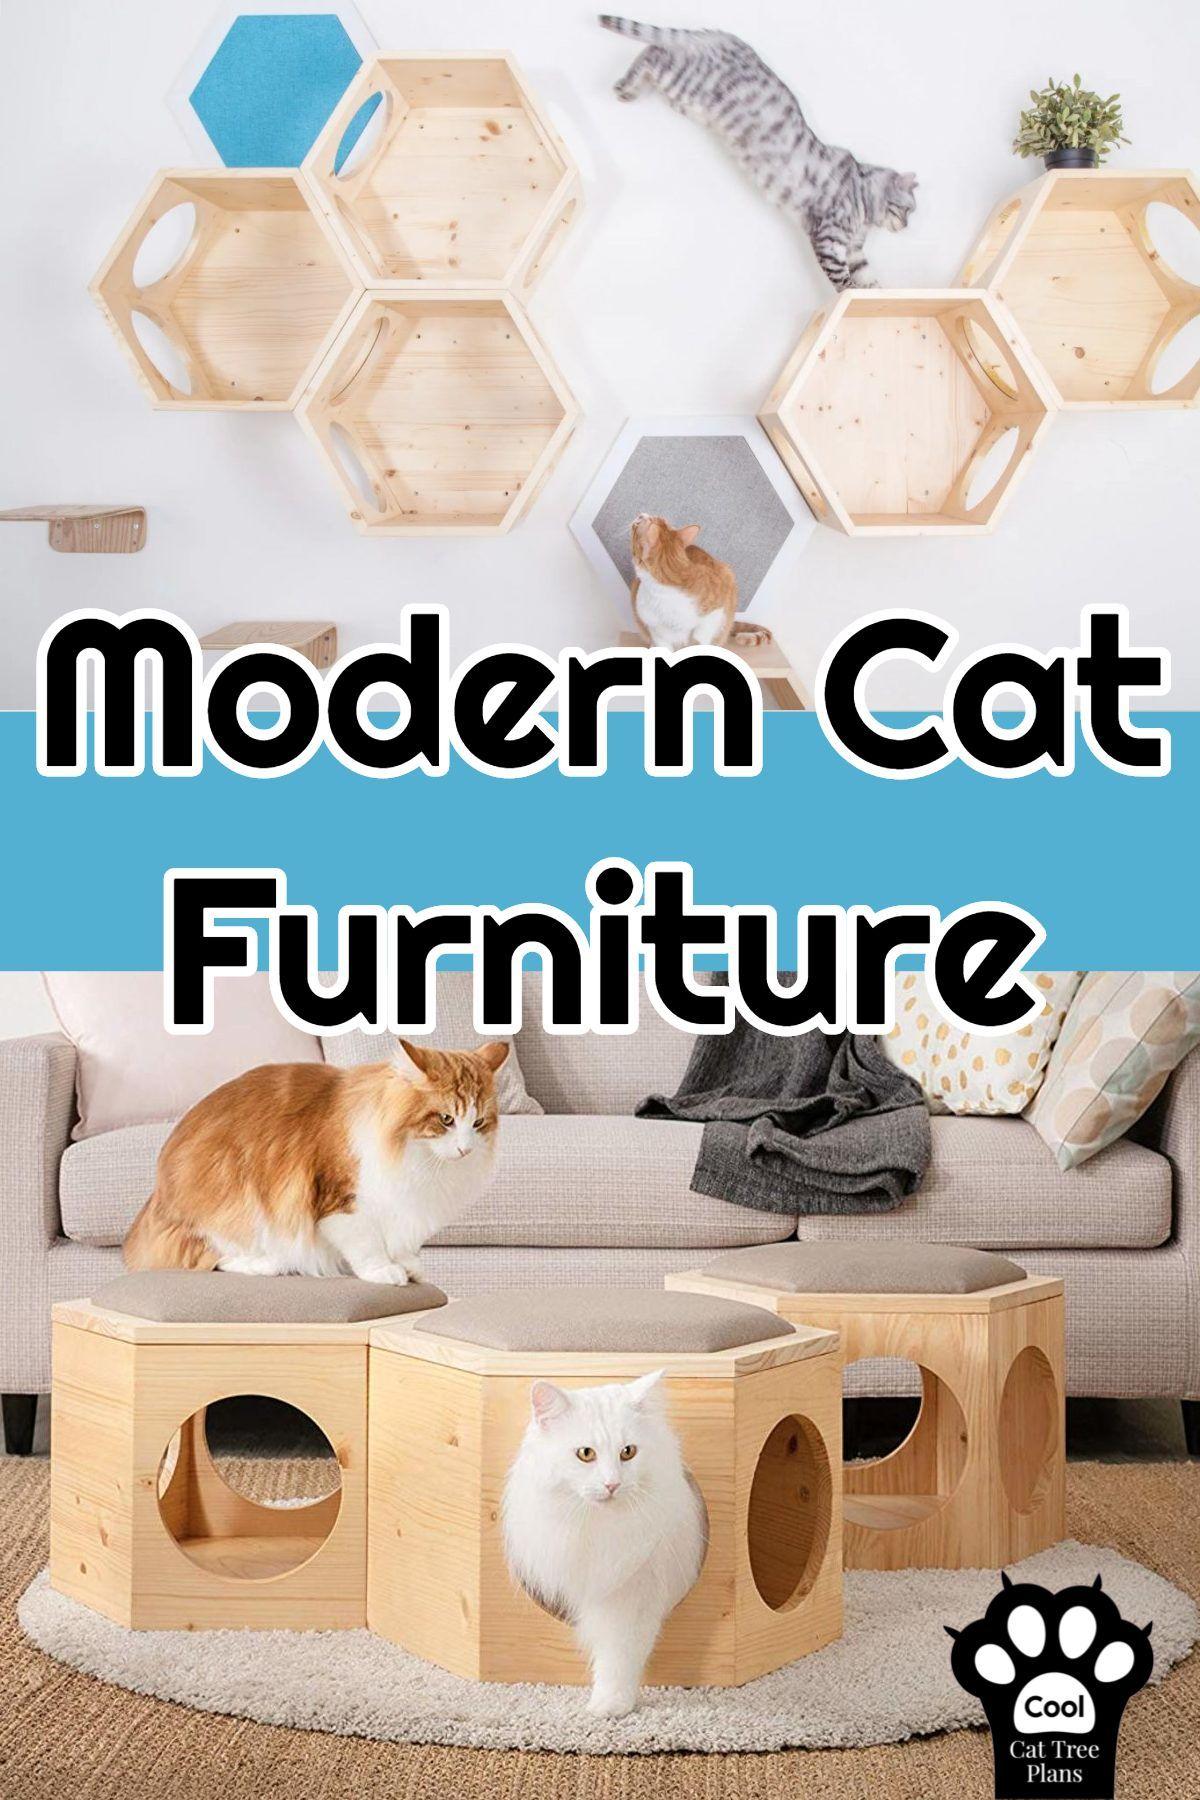 Myzoo Cat Furniture Cool Cat Tree Plans Cat Tree Plans Cool Cat Trees Cat Furniture